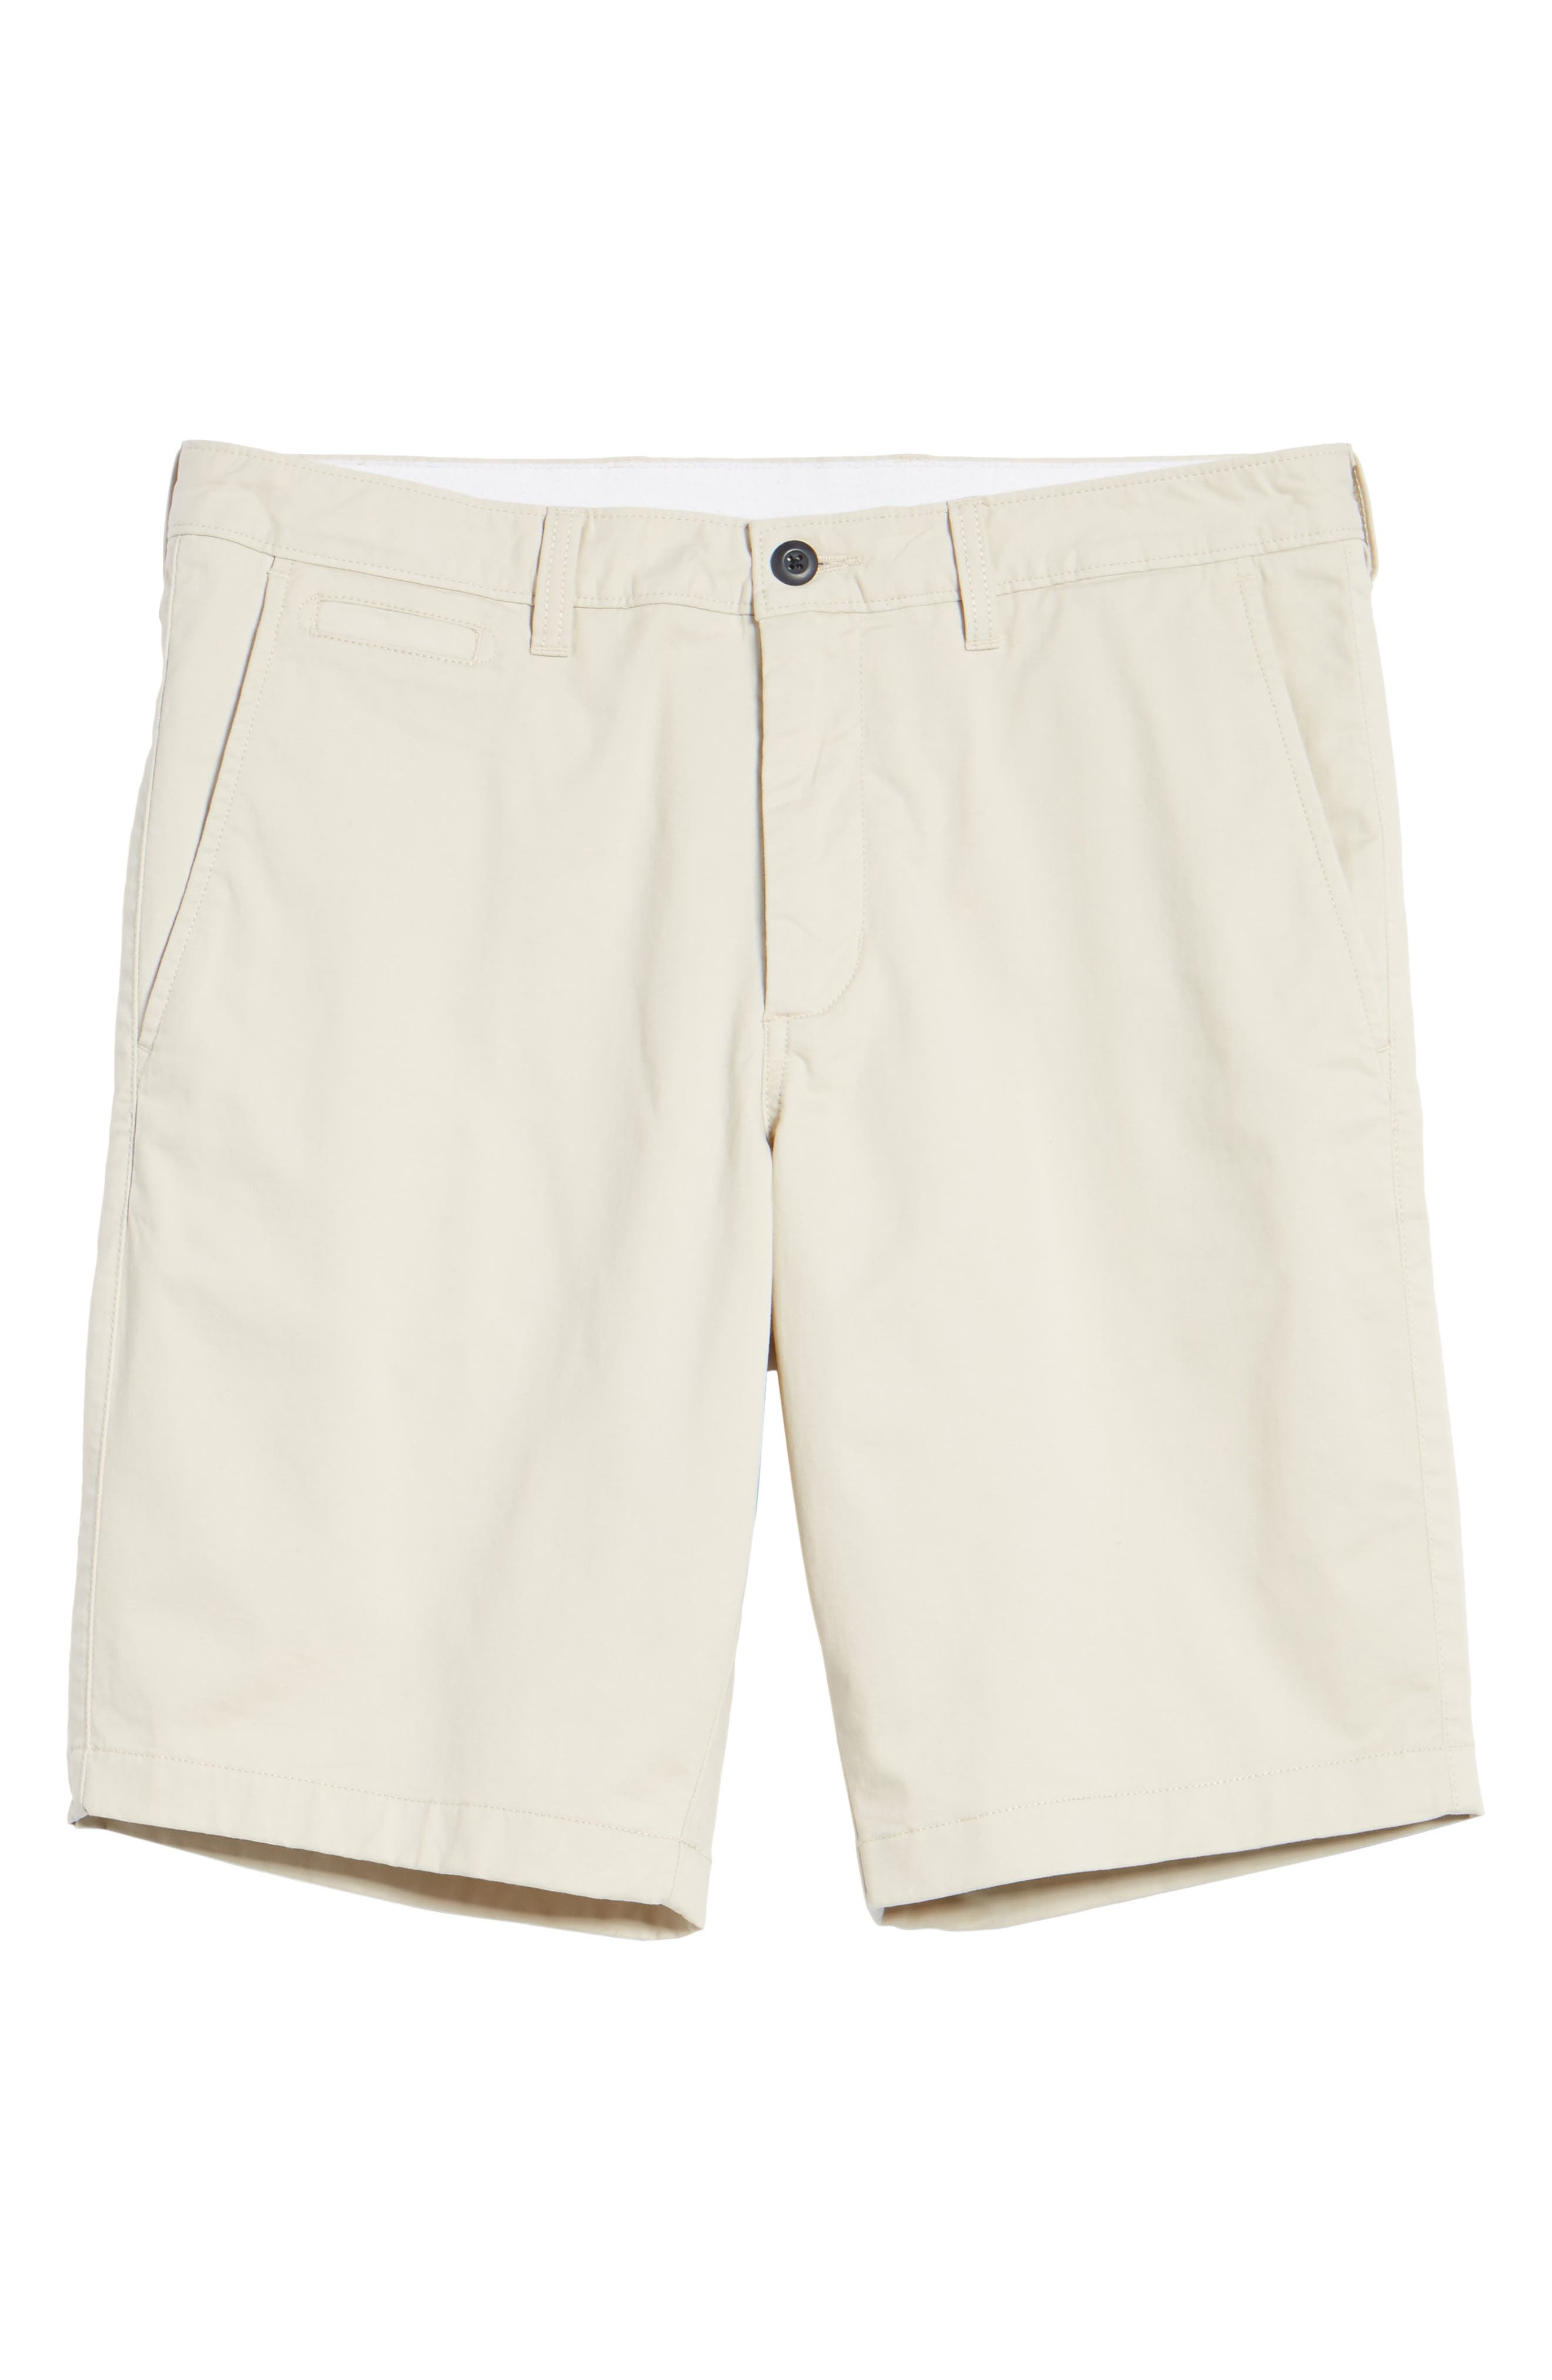 Ballard Slim Fit Stretch Chino 11-Inch Shorts,                             Alternate thumbnail 79, color,